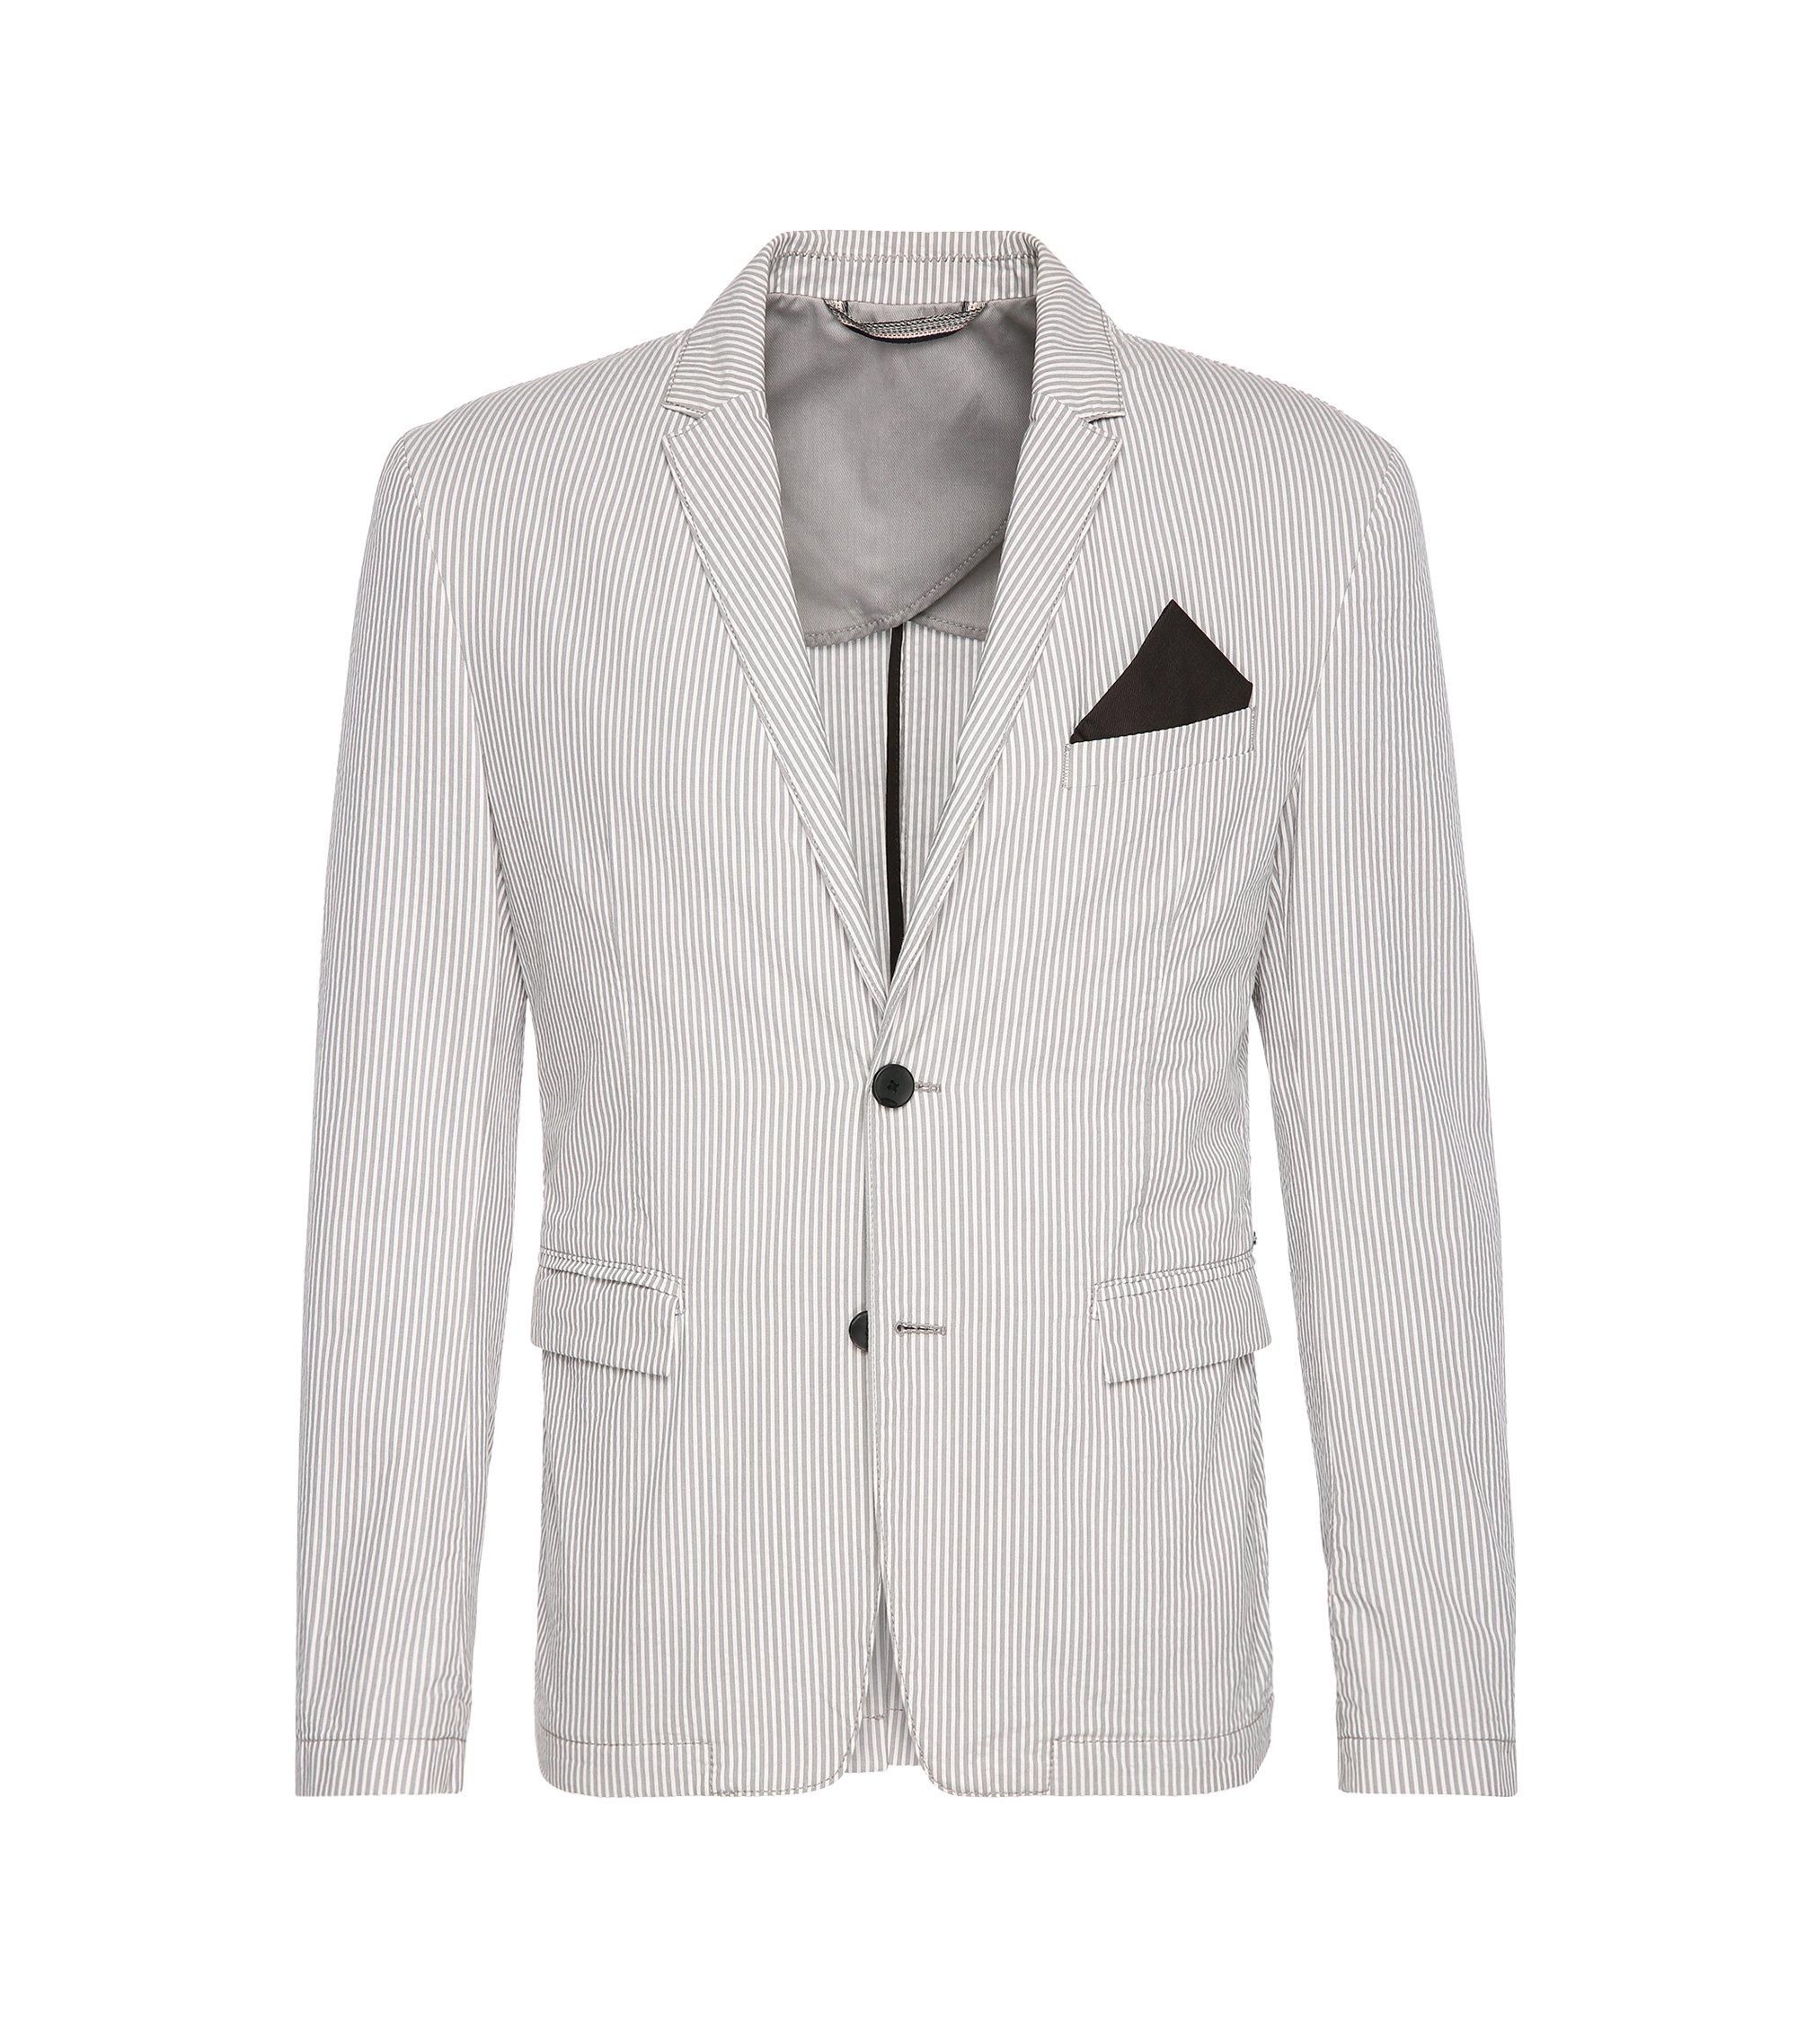 Cotton Seersucker Sport Coat, Slim Fit | Bans BS W, Open White